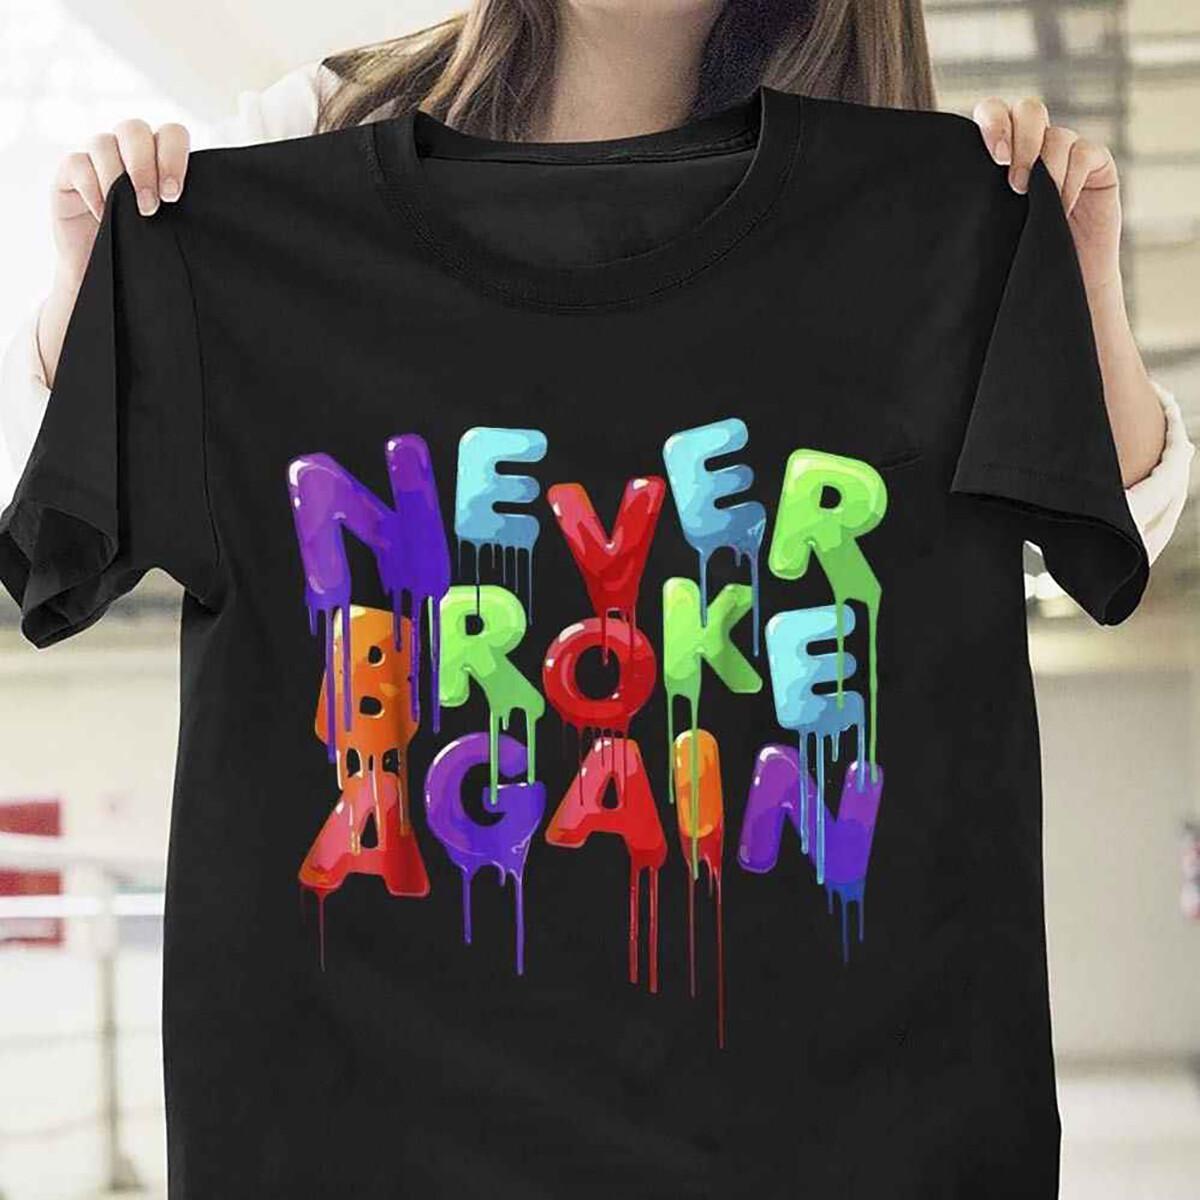 Youngboy Never Broke Again Colorful T Shirt Black Cotton Men T-Shirt Cartoon t shirt men Unisex New Fashion tshirt